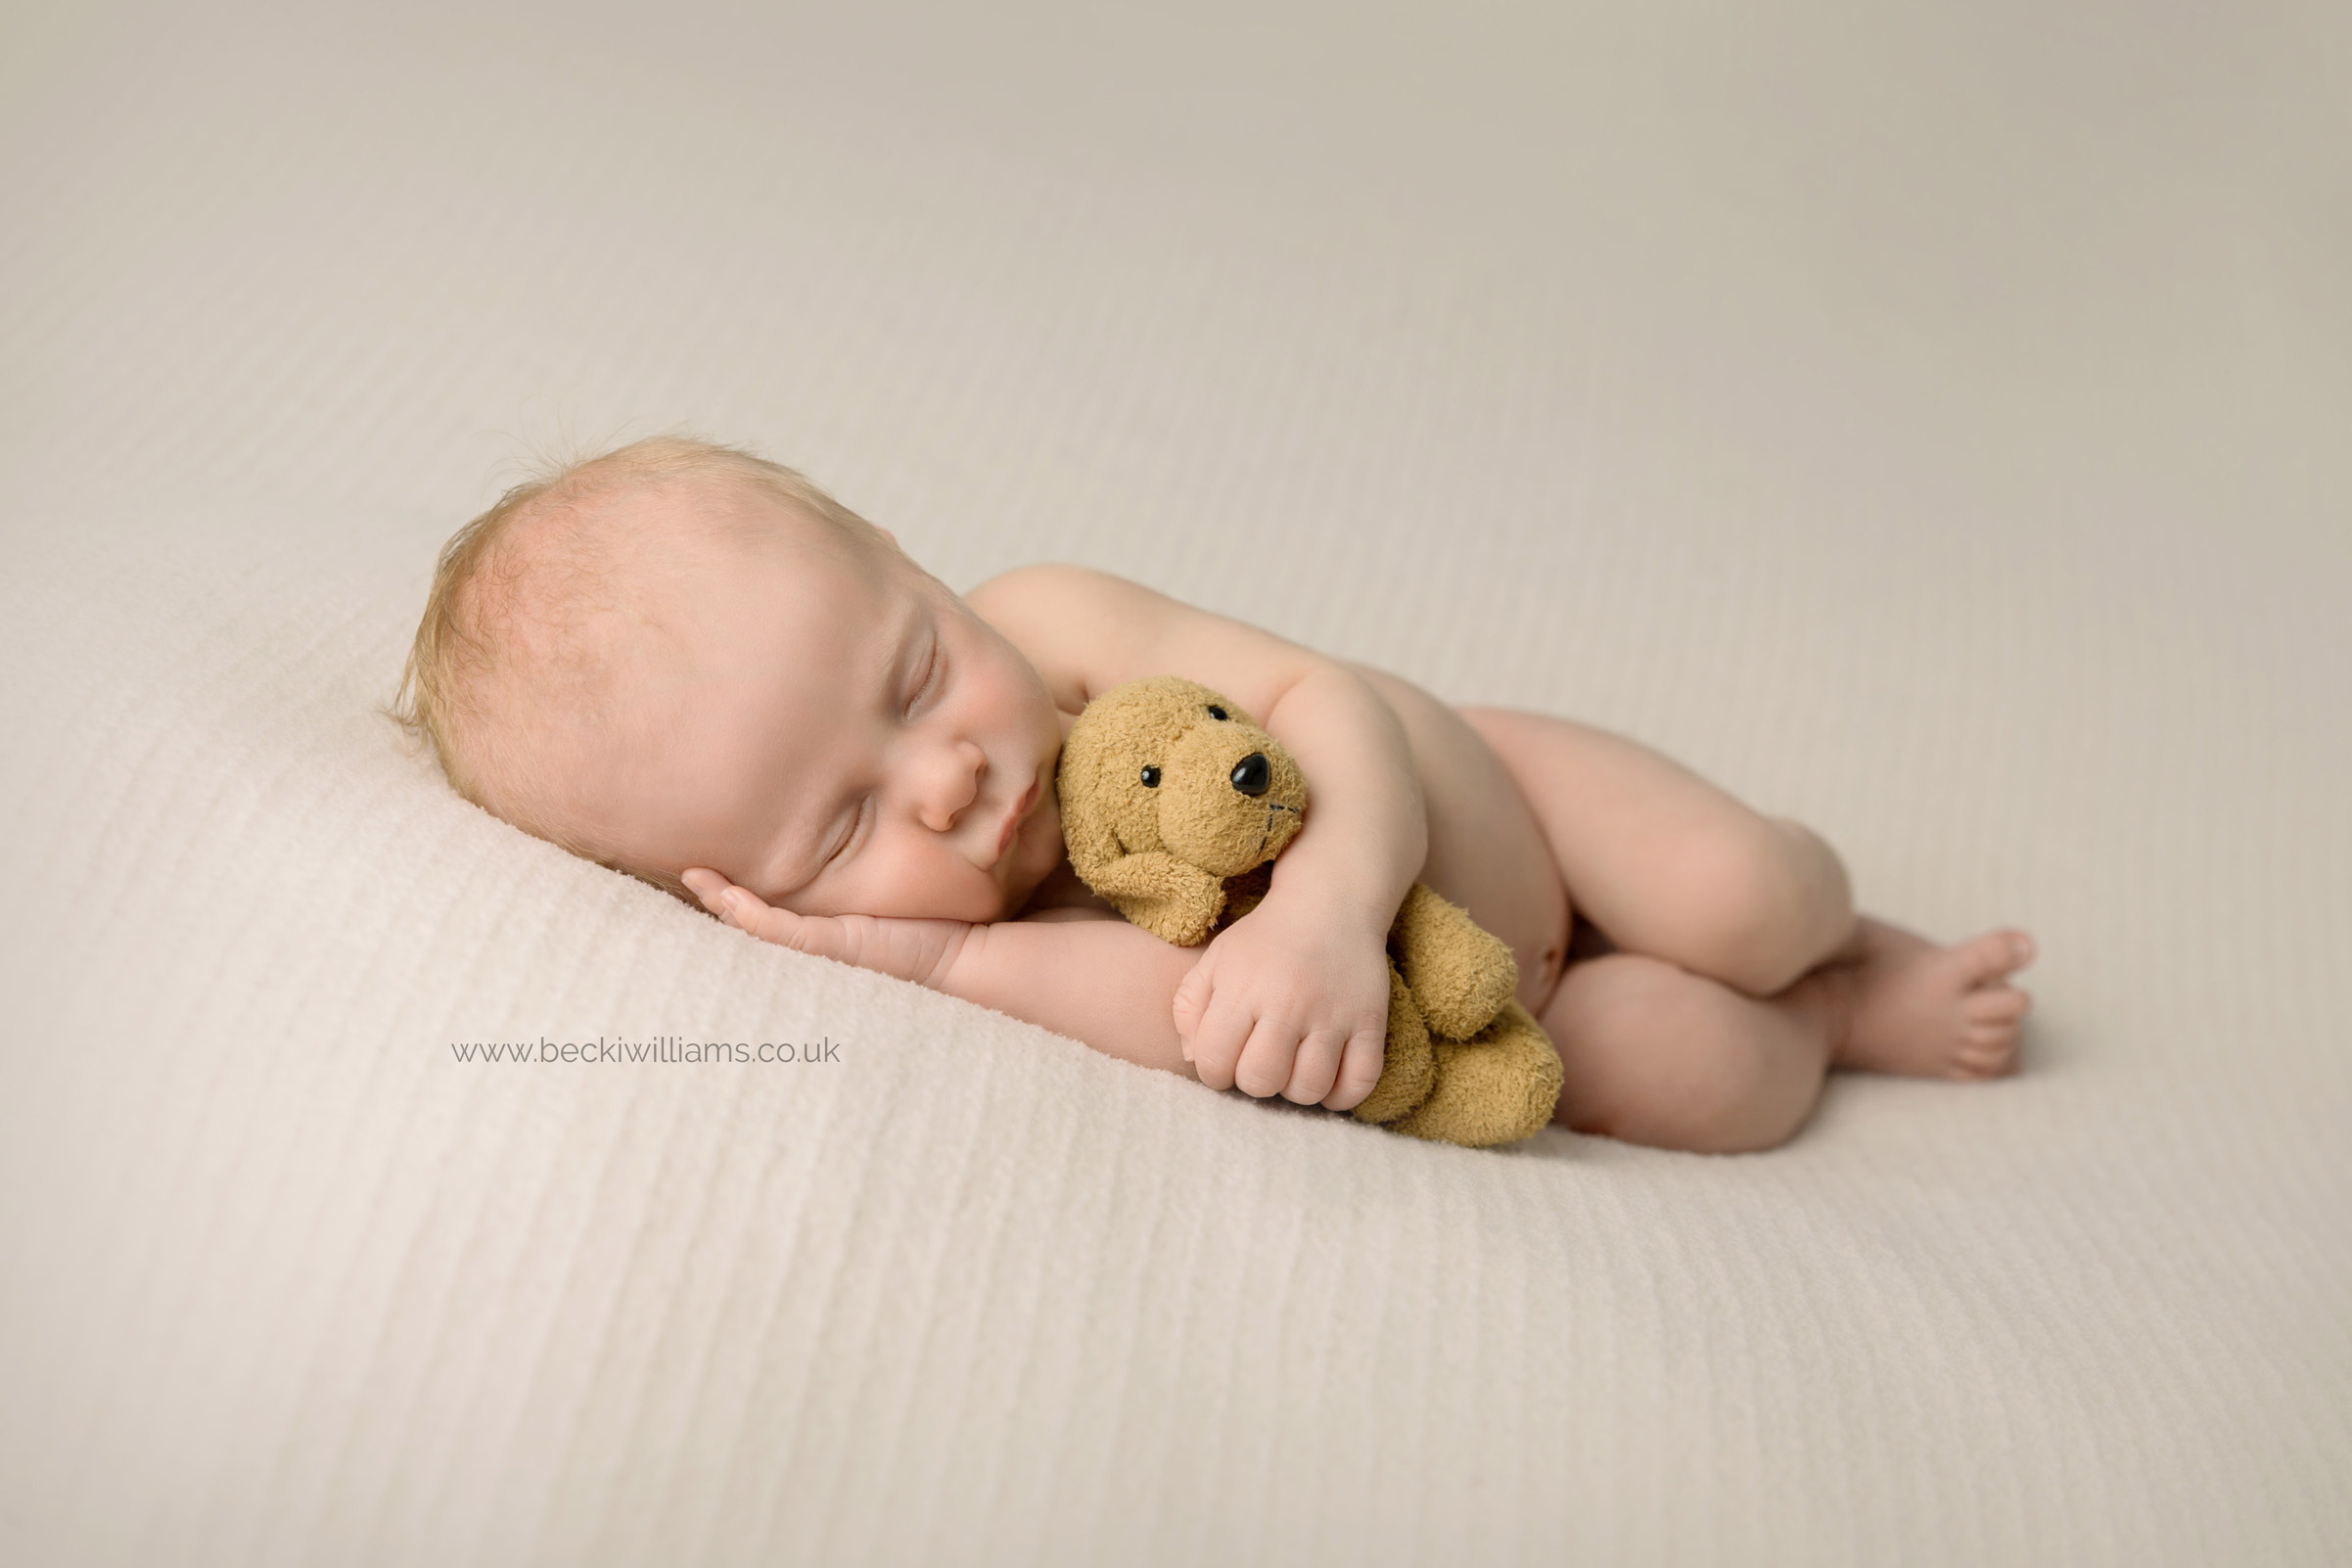 newborn boy cuddles toy dog while asleep